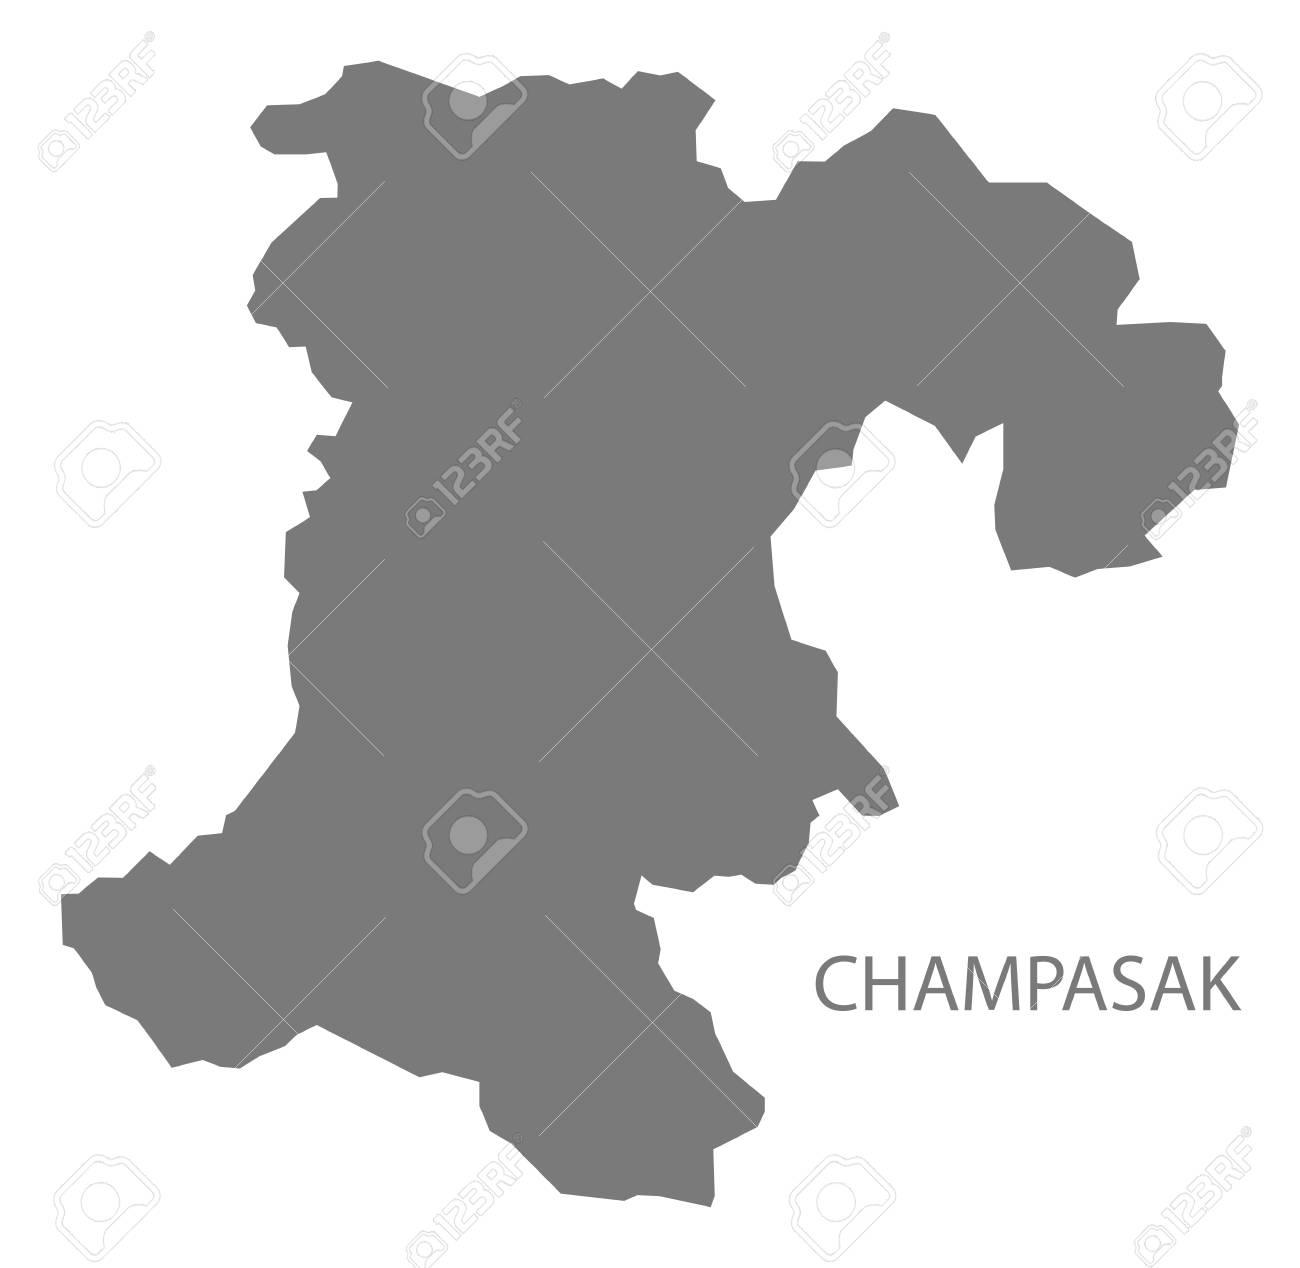 Champasak Province Map Of Laos Grey Illustration Silhouette Shape